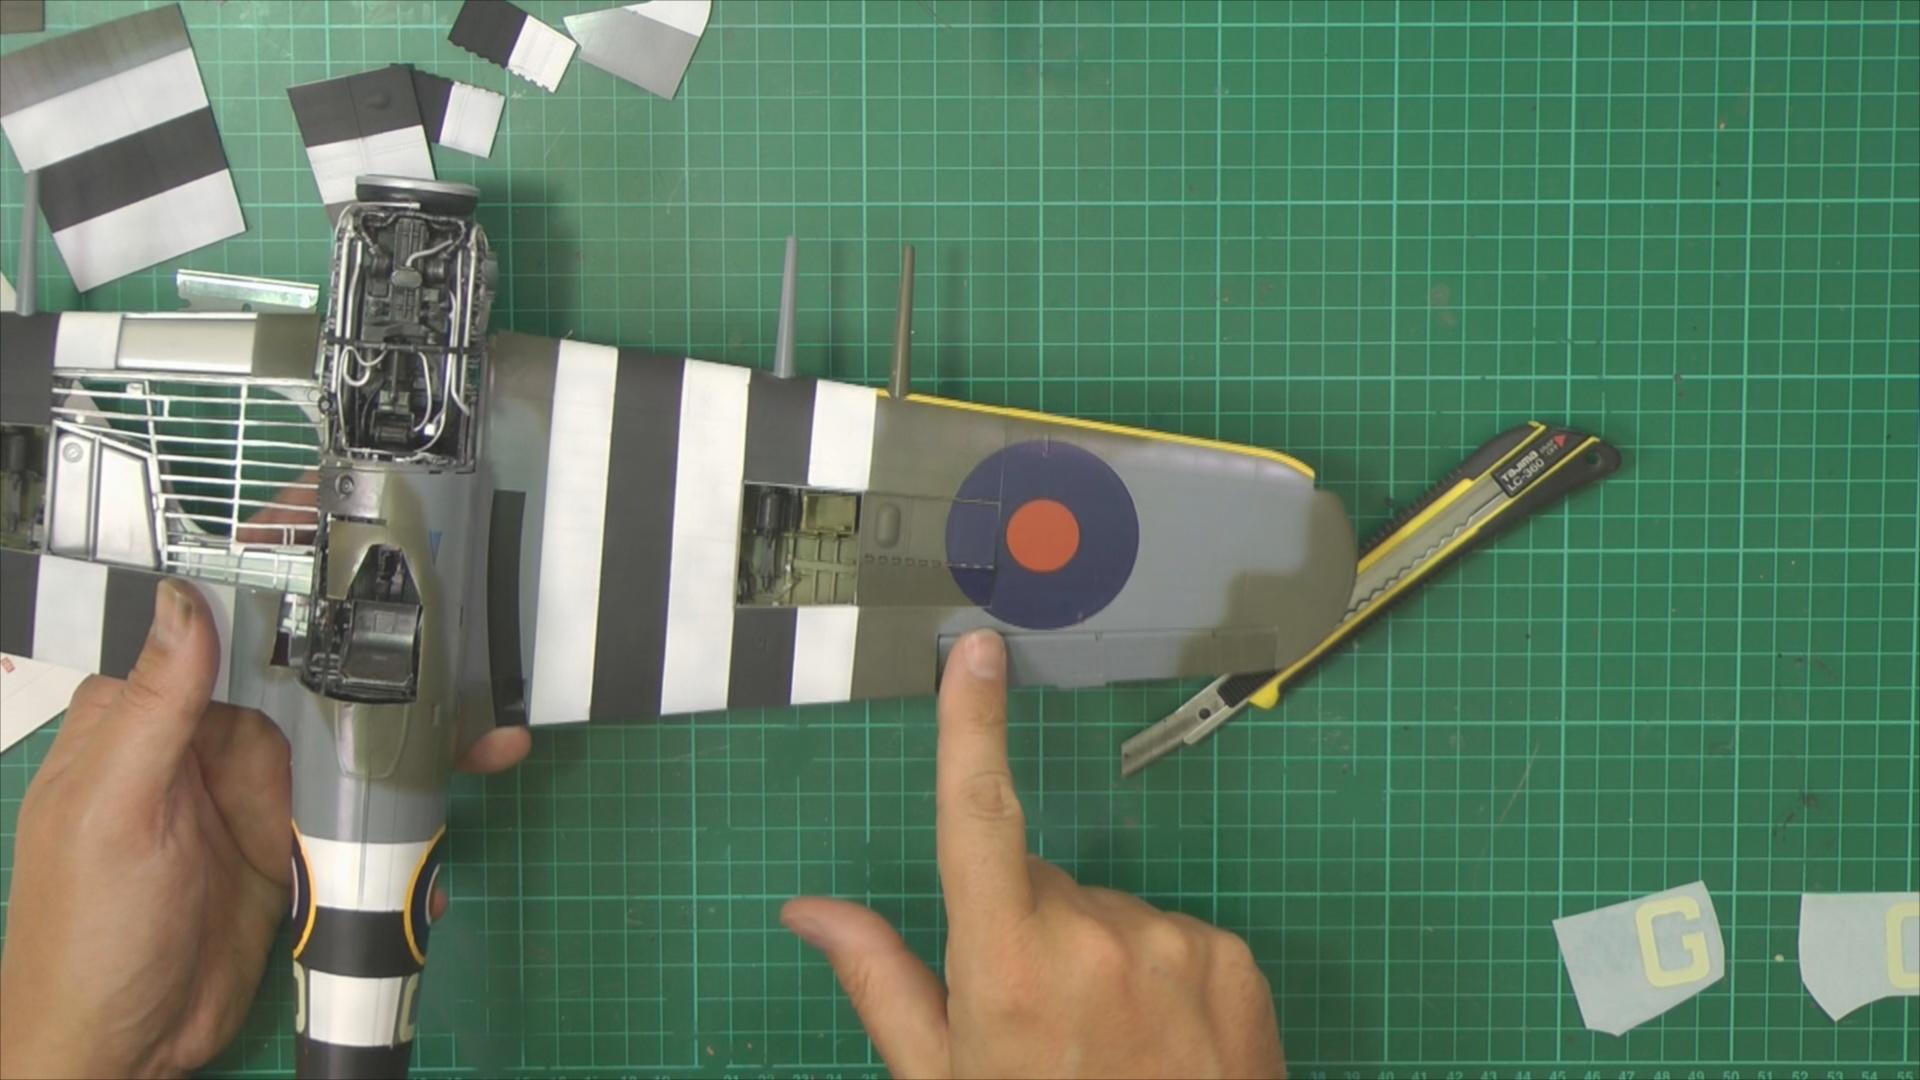 Hawker+Typhoon+Part+10+Pic+2.jpg